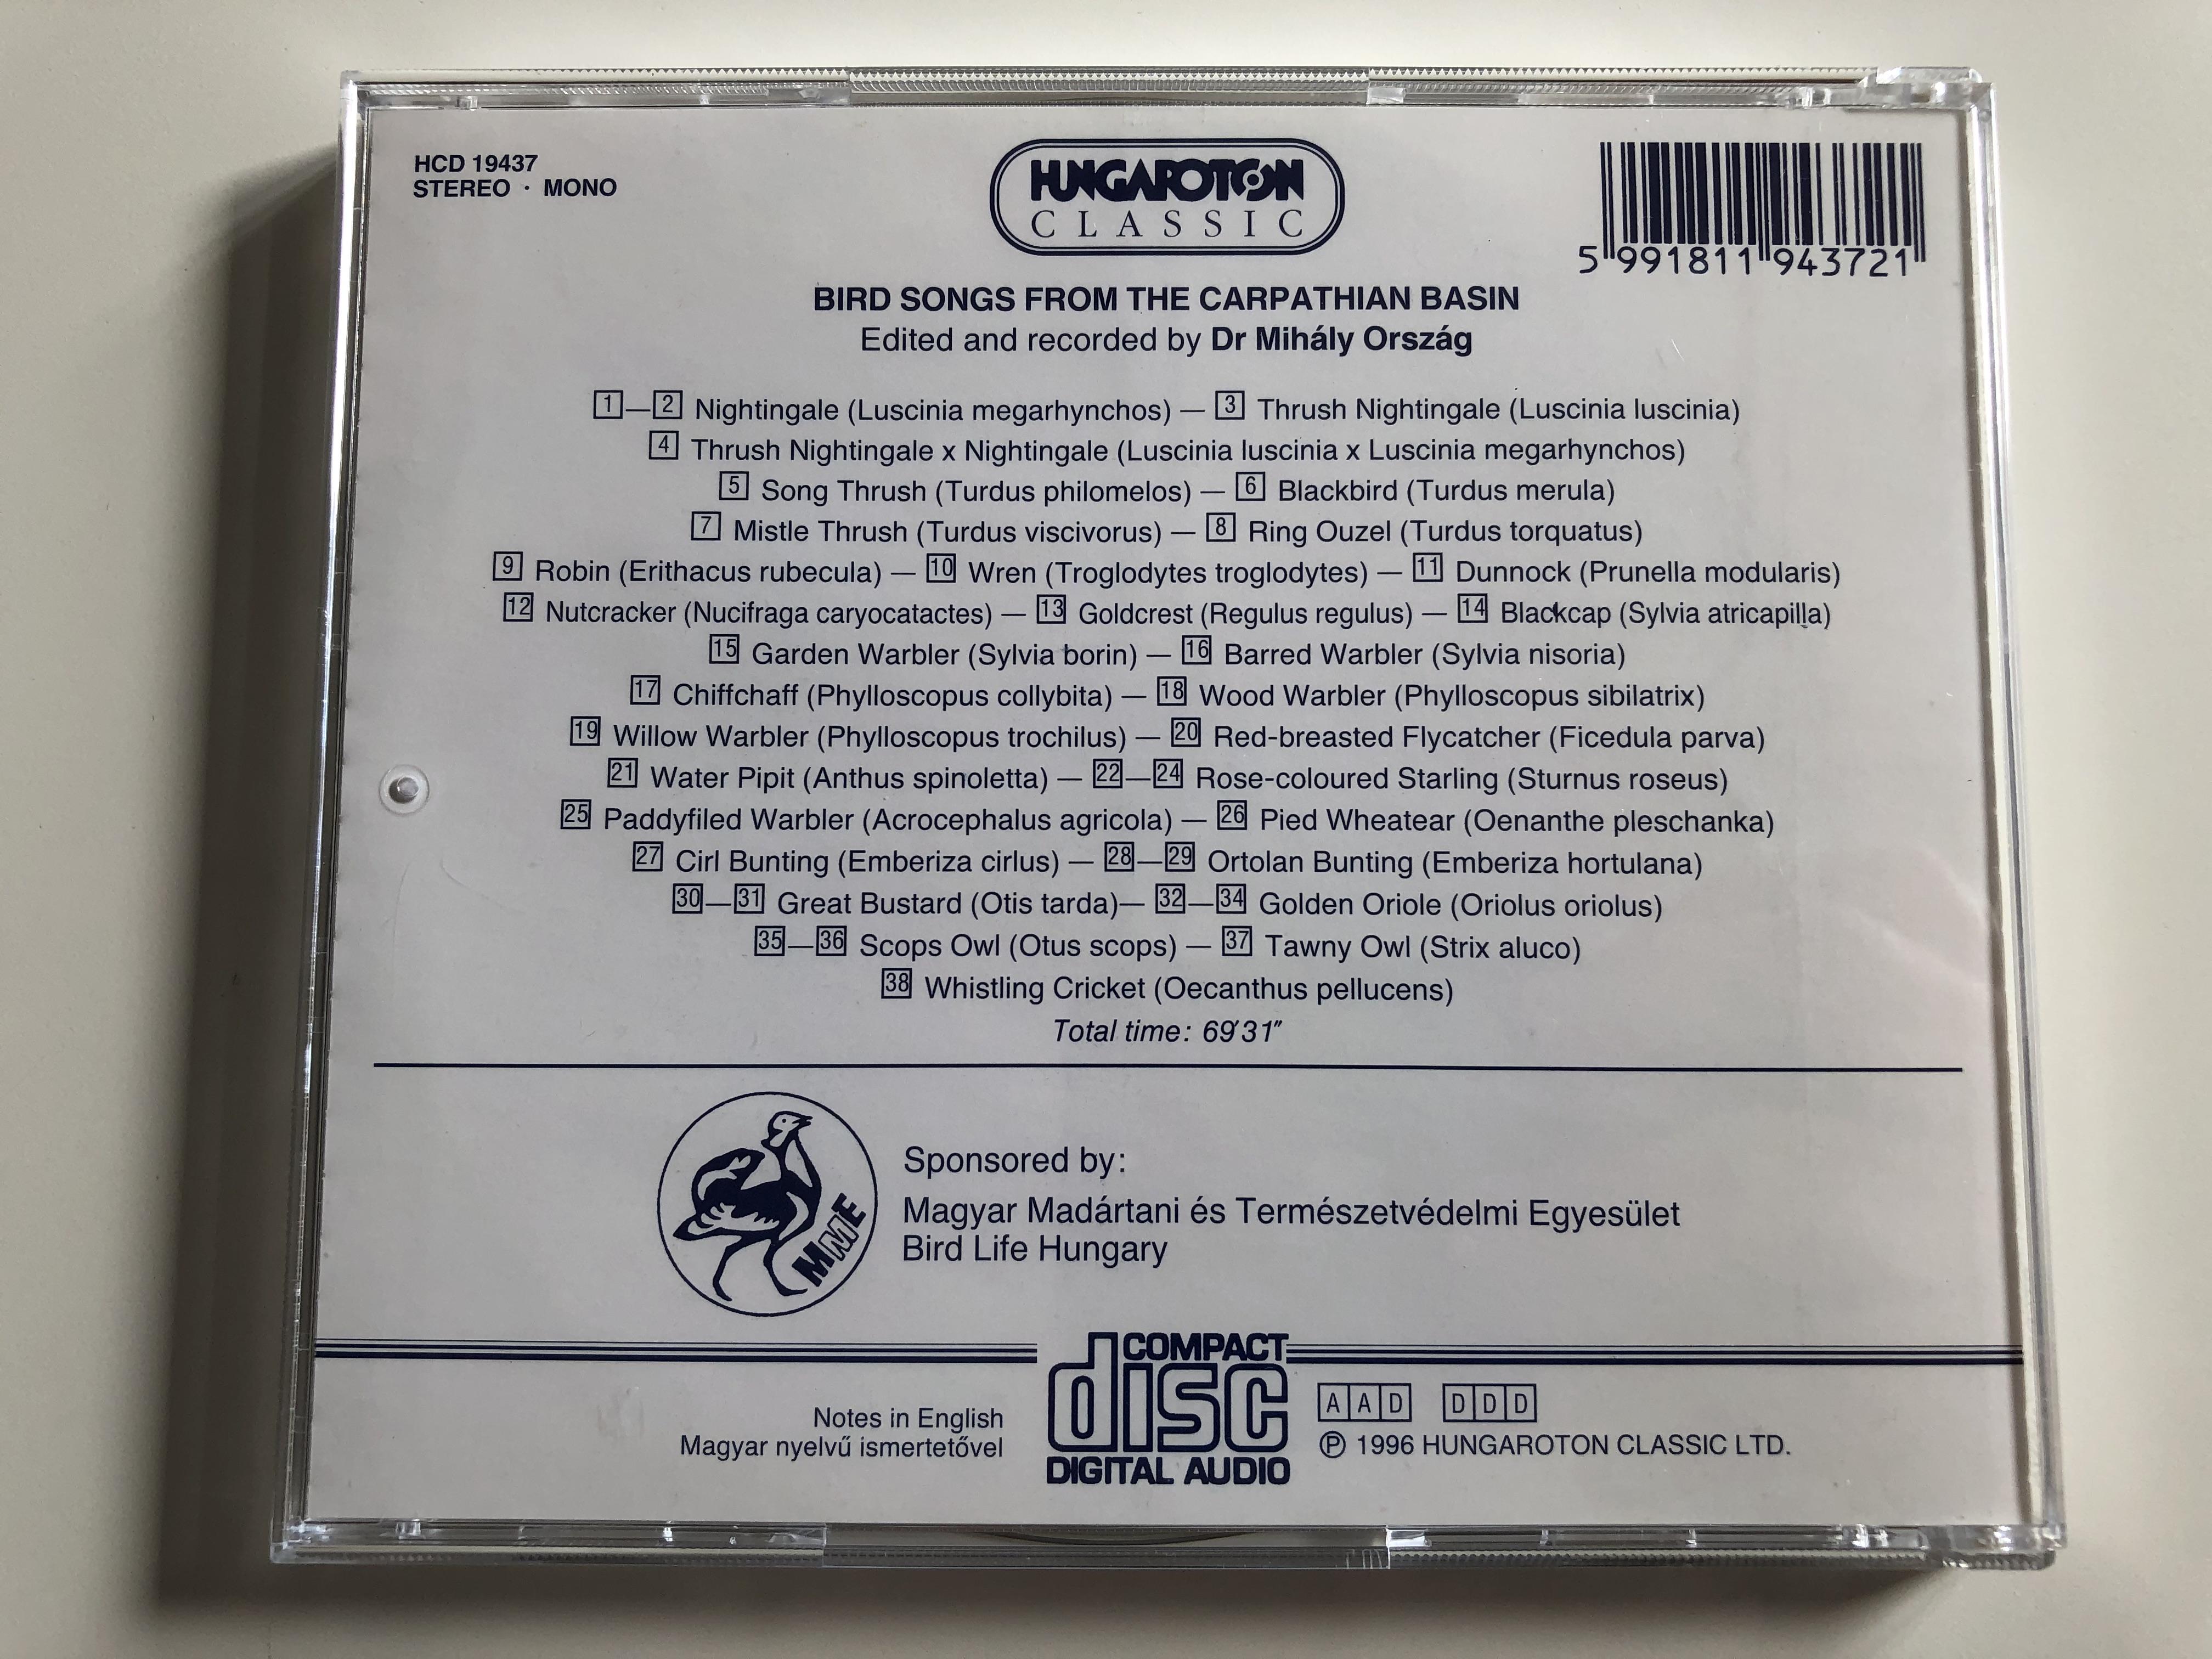 -bird-songs-from-the-carpathian-basin-recorded-by-dr.-mih-ly-orsz-g-mad-r-nekek-a-k-rp-t-medenc-b-l-hungaroton-classic-audio-cd-1996-hcd-19437-9-.jpg